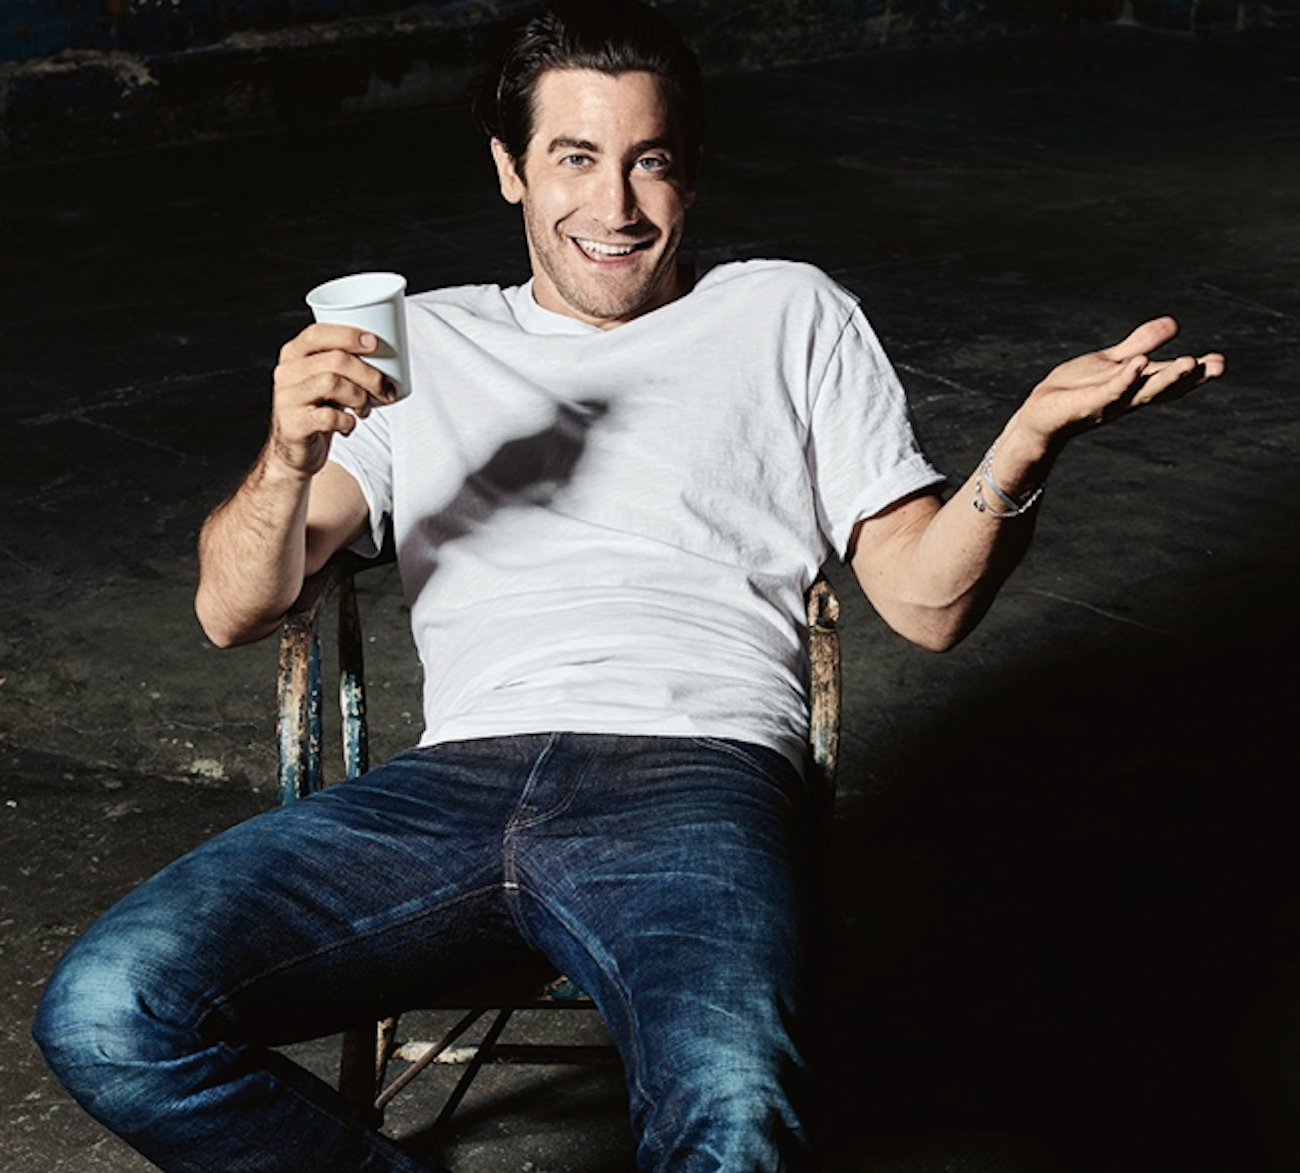 Chris Meloni Brian Bloom Amazing my new plaid pants: jake gyllenhaal eight times